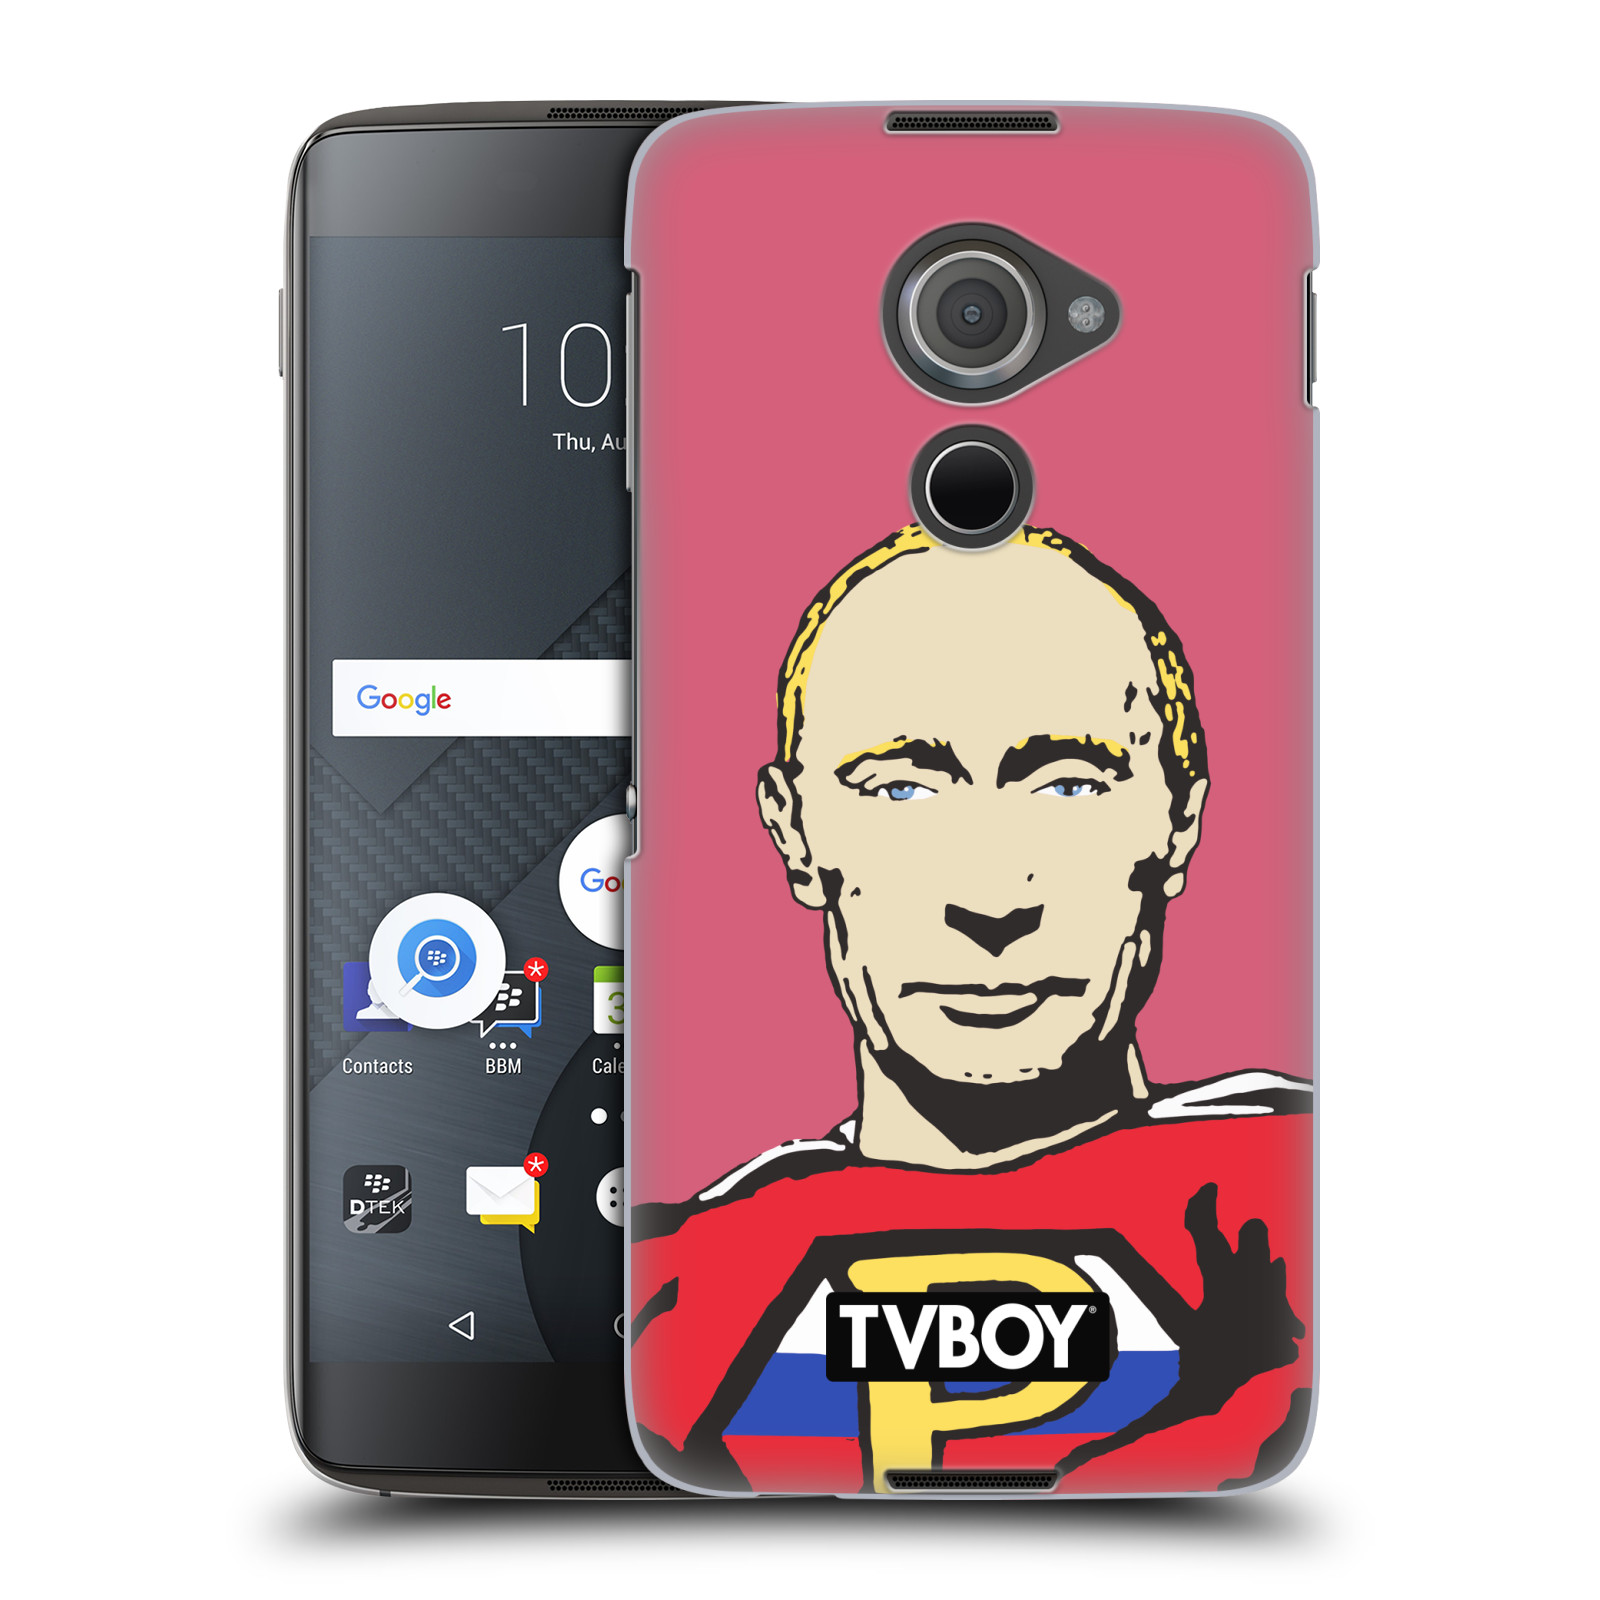 Plastové pouzdro na mobil Blackberry DTEK60 (Argon) - Head Case - TVBOY - Super Putin